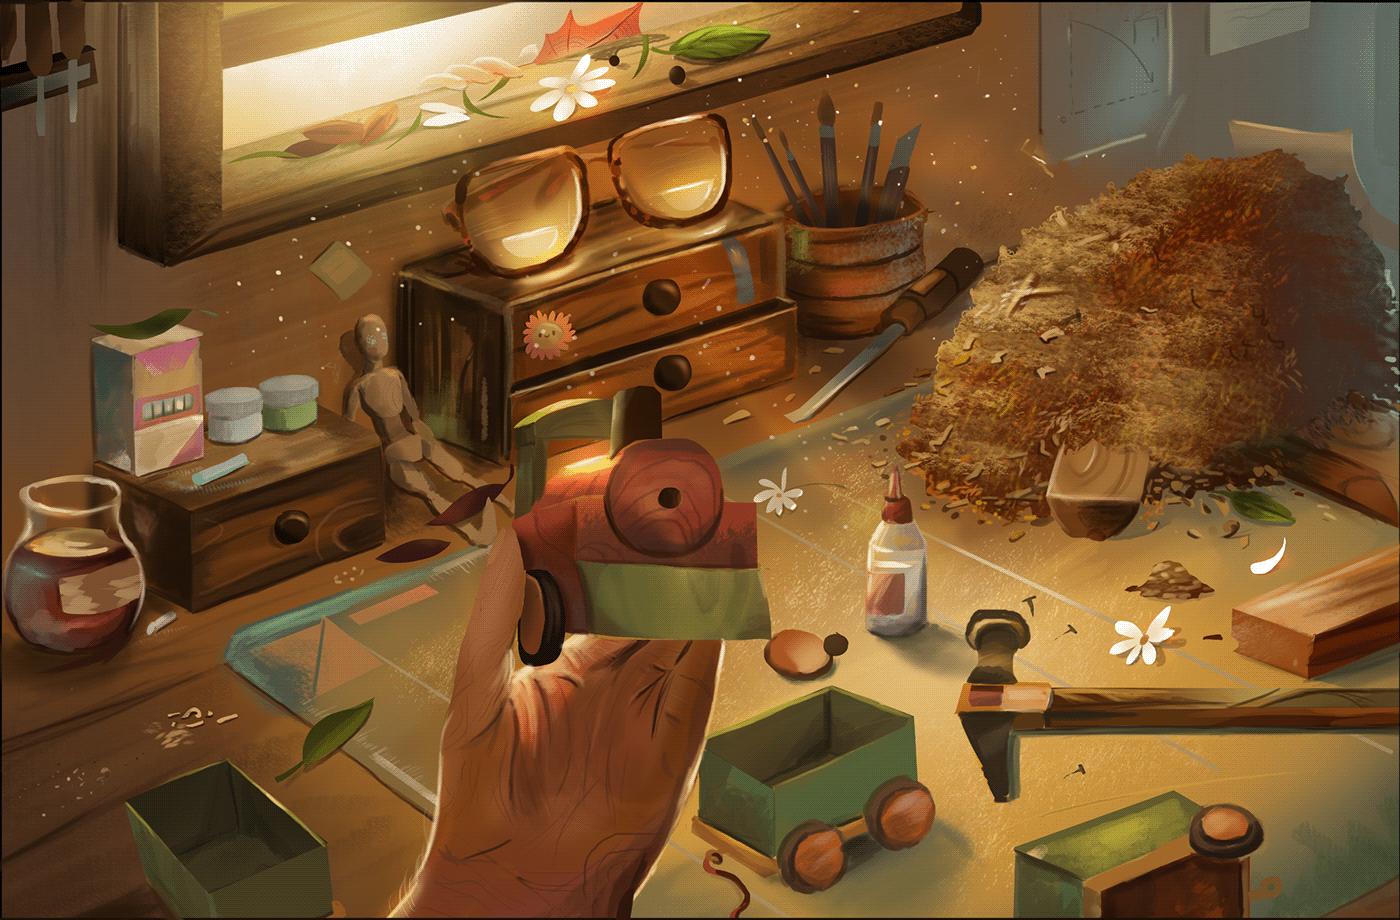 concept art ilustracion videojuegos Games ILLUSTRATION  Raincup Games Felipe Luna juguetes